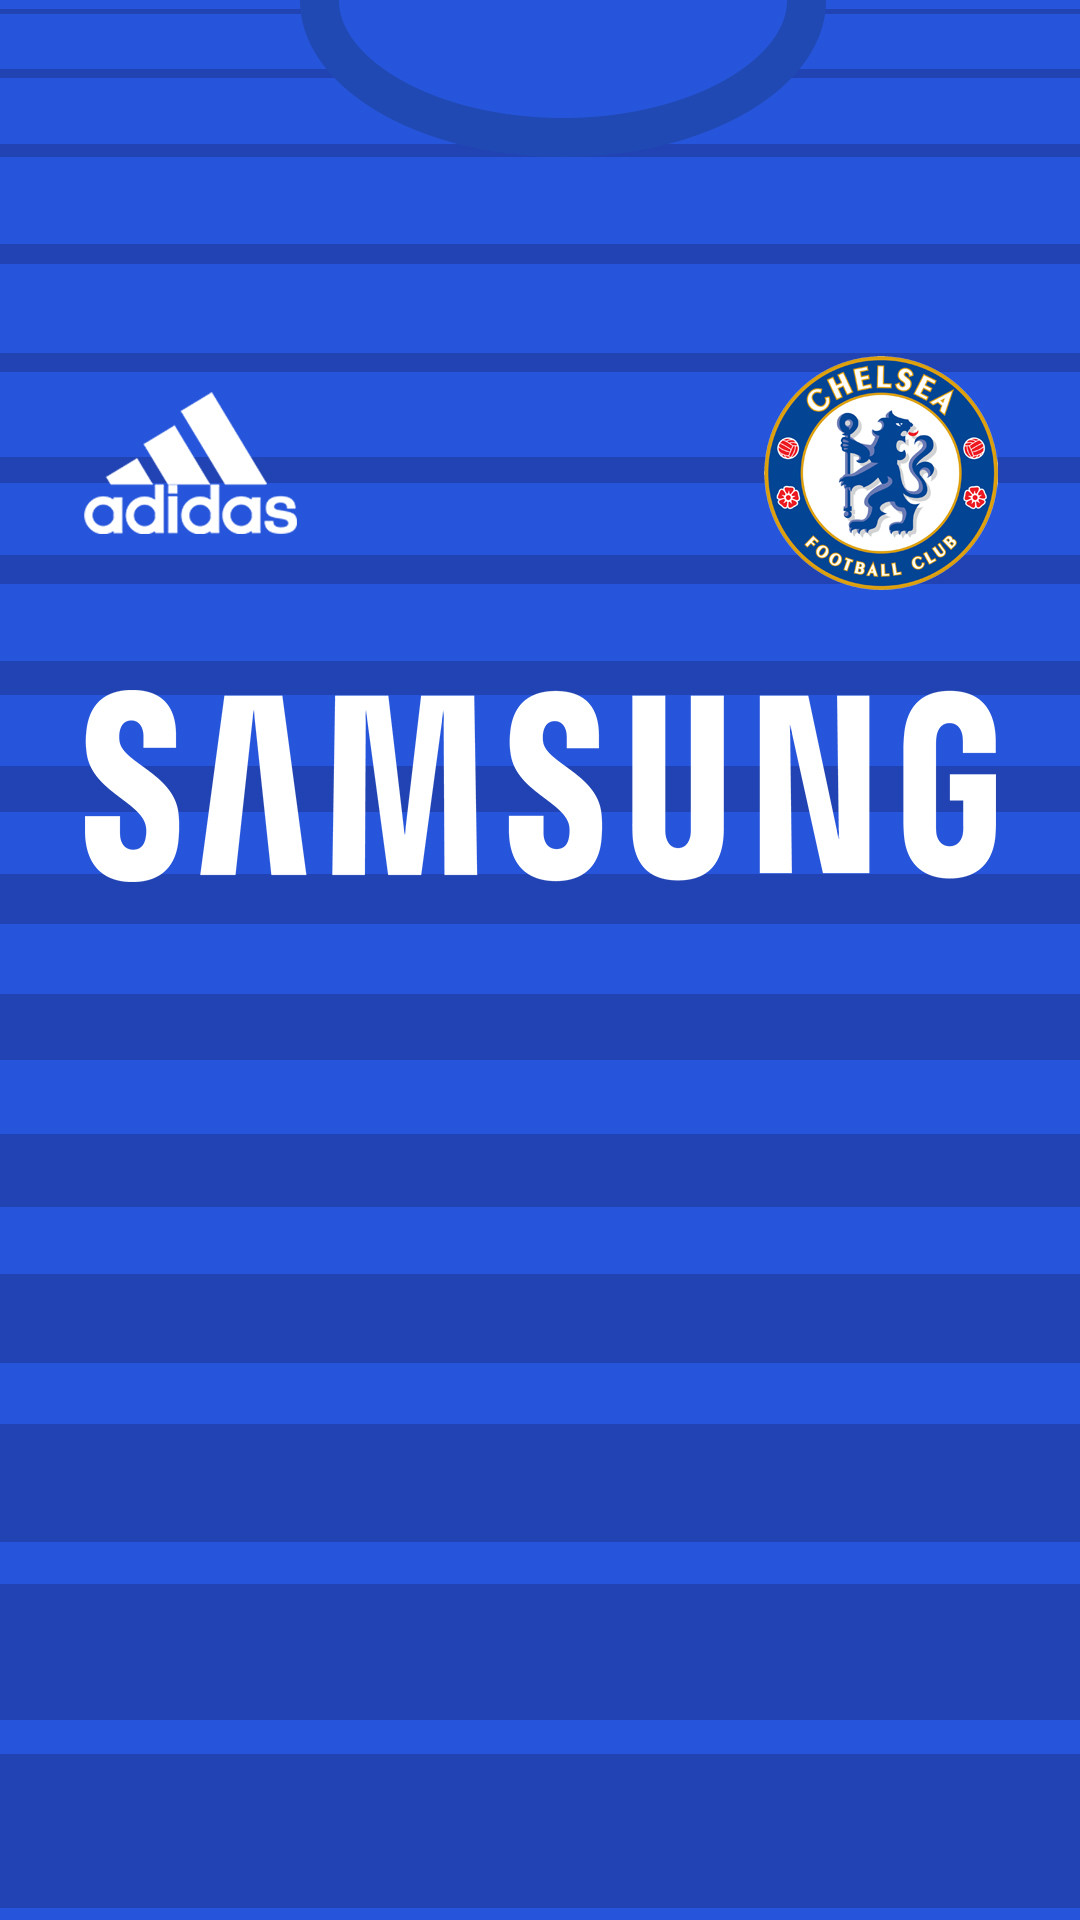 Logo Chelsea Wallpaper 2018 ·â' WallpaperTag